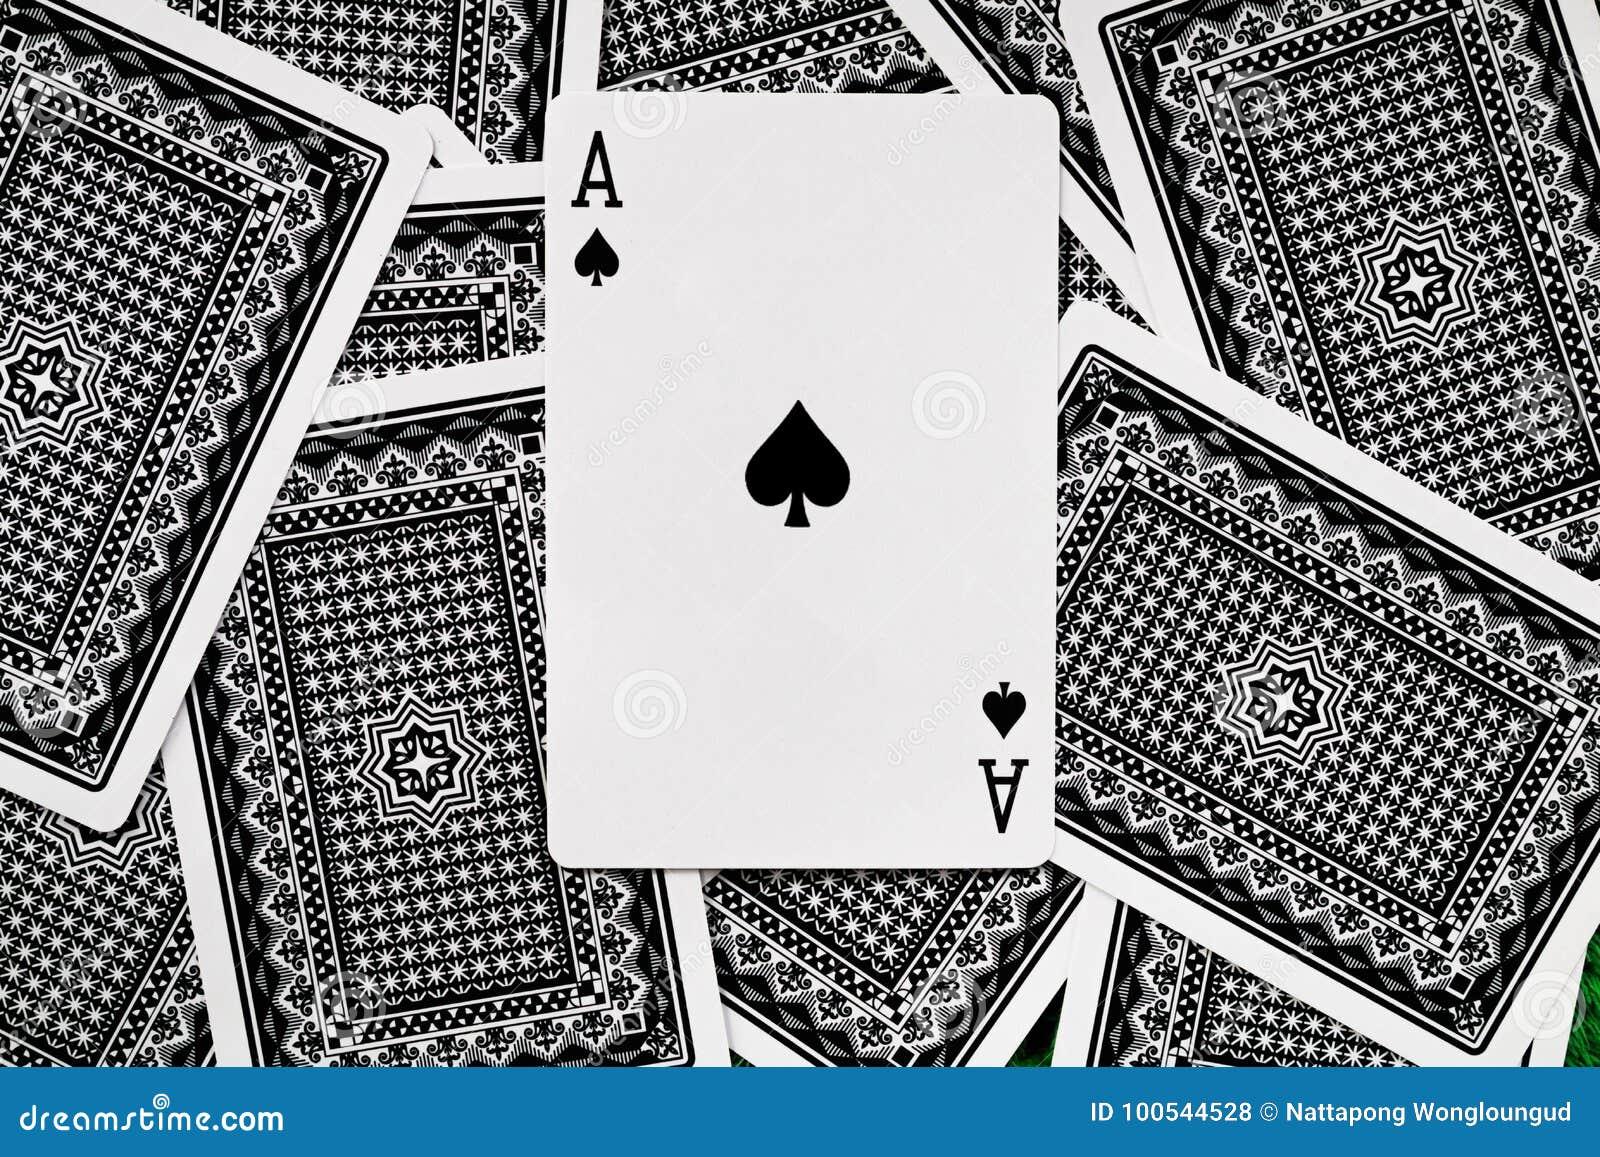 Gambling card.